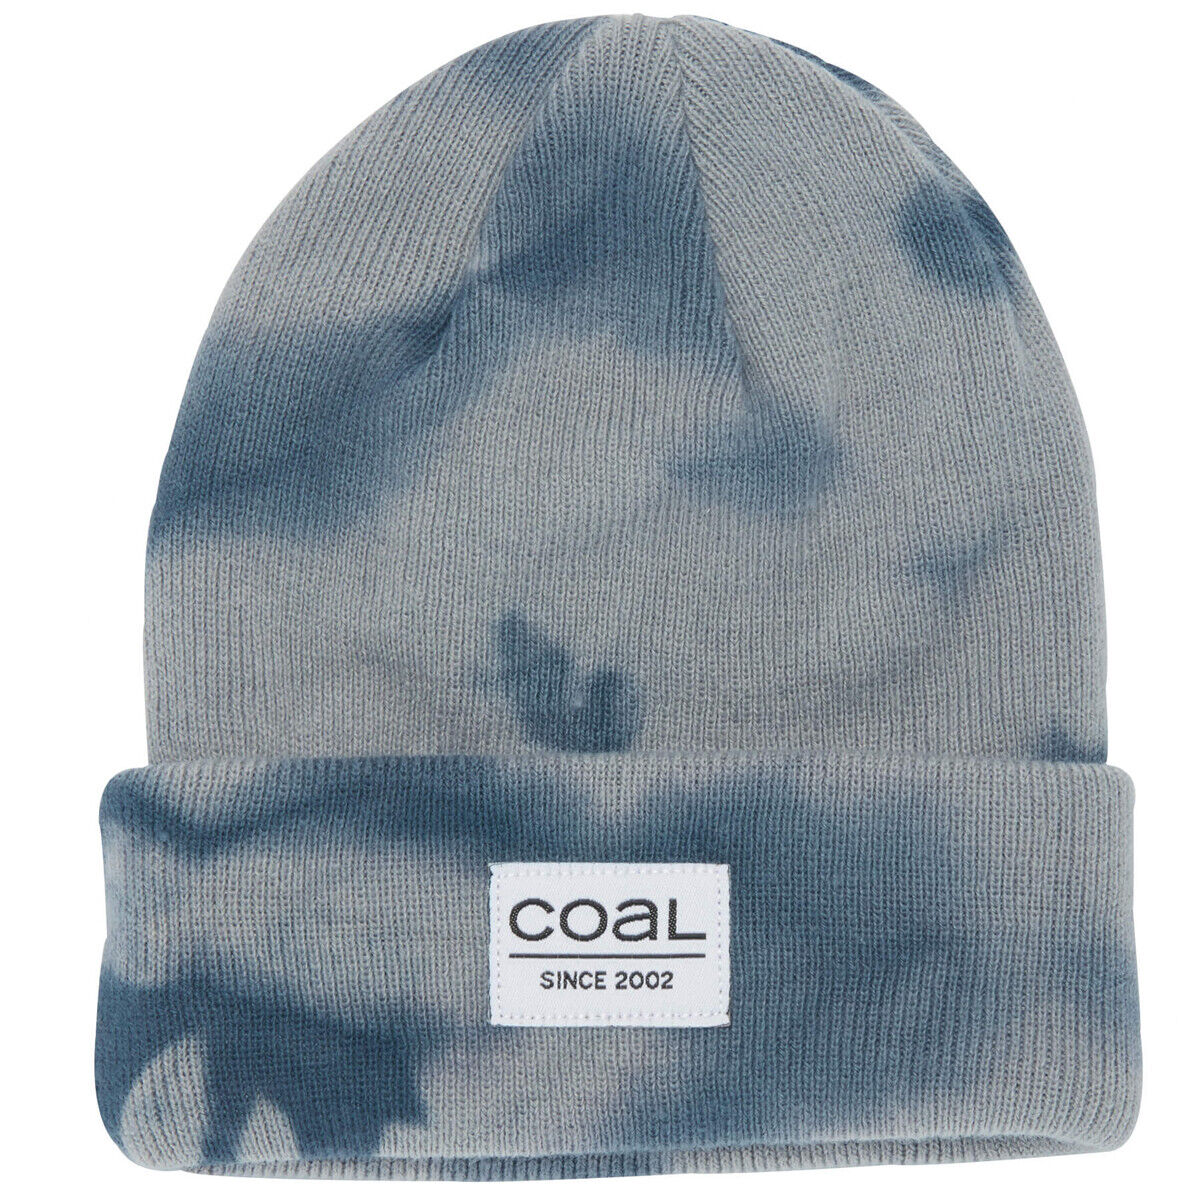 Coal The Standard Beanie Grey Tie Dye Skate Surf Street Style Mütze Wandern NEU